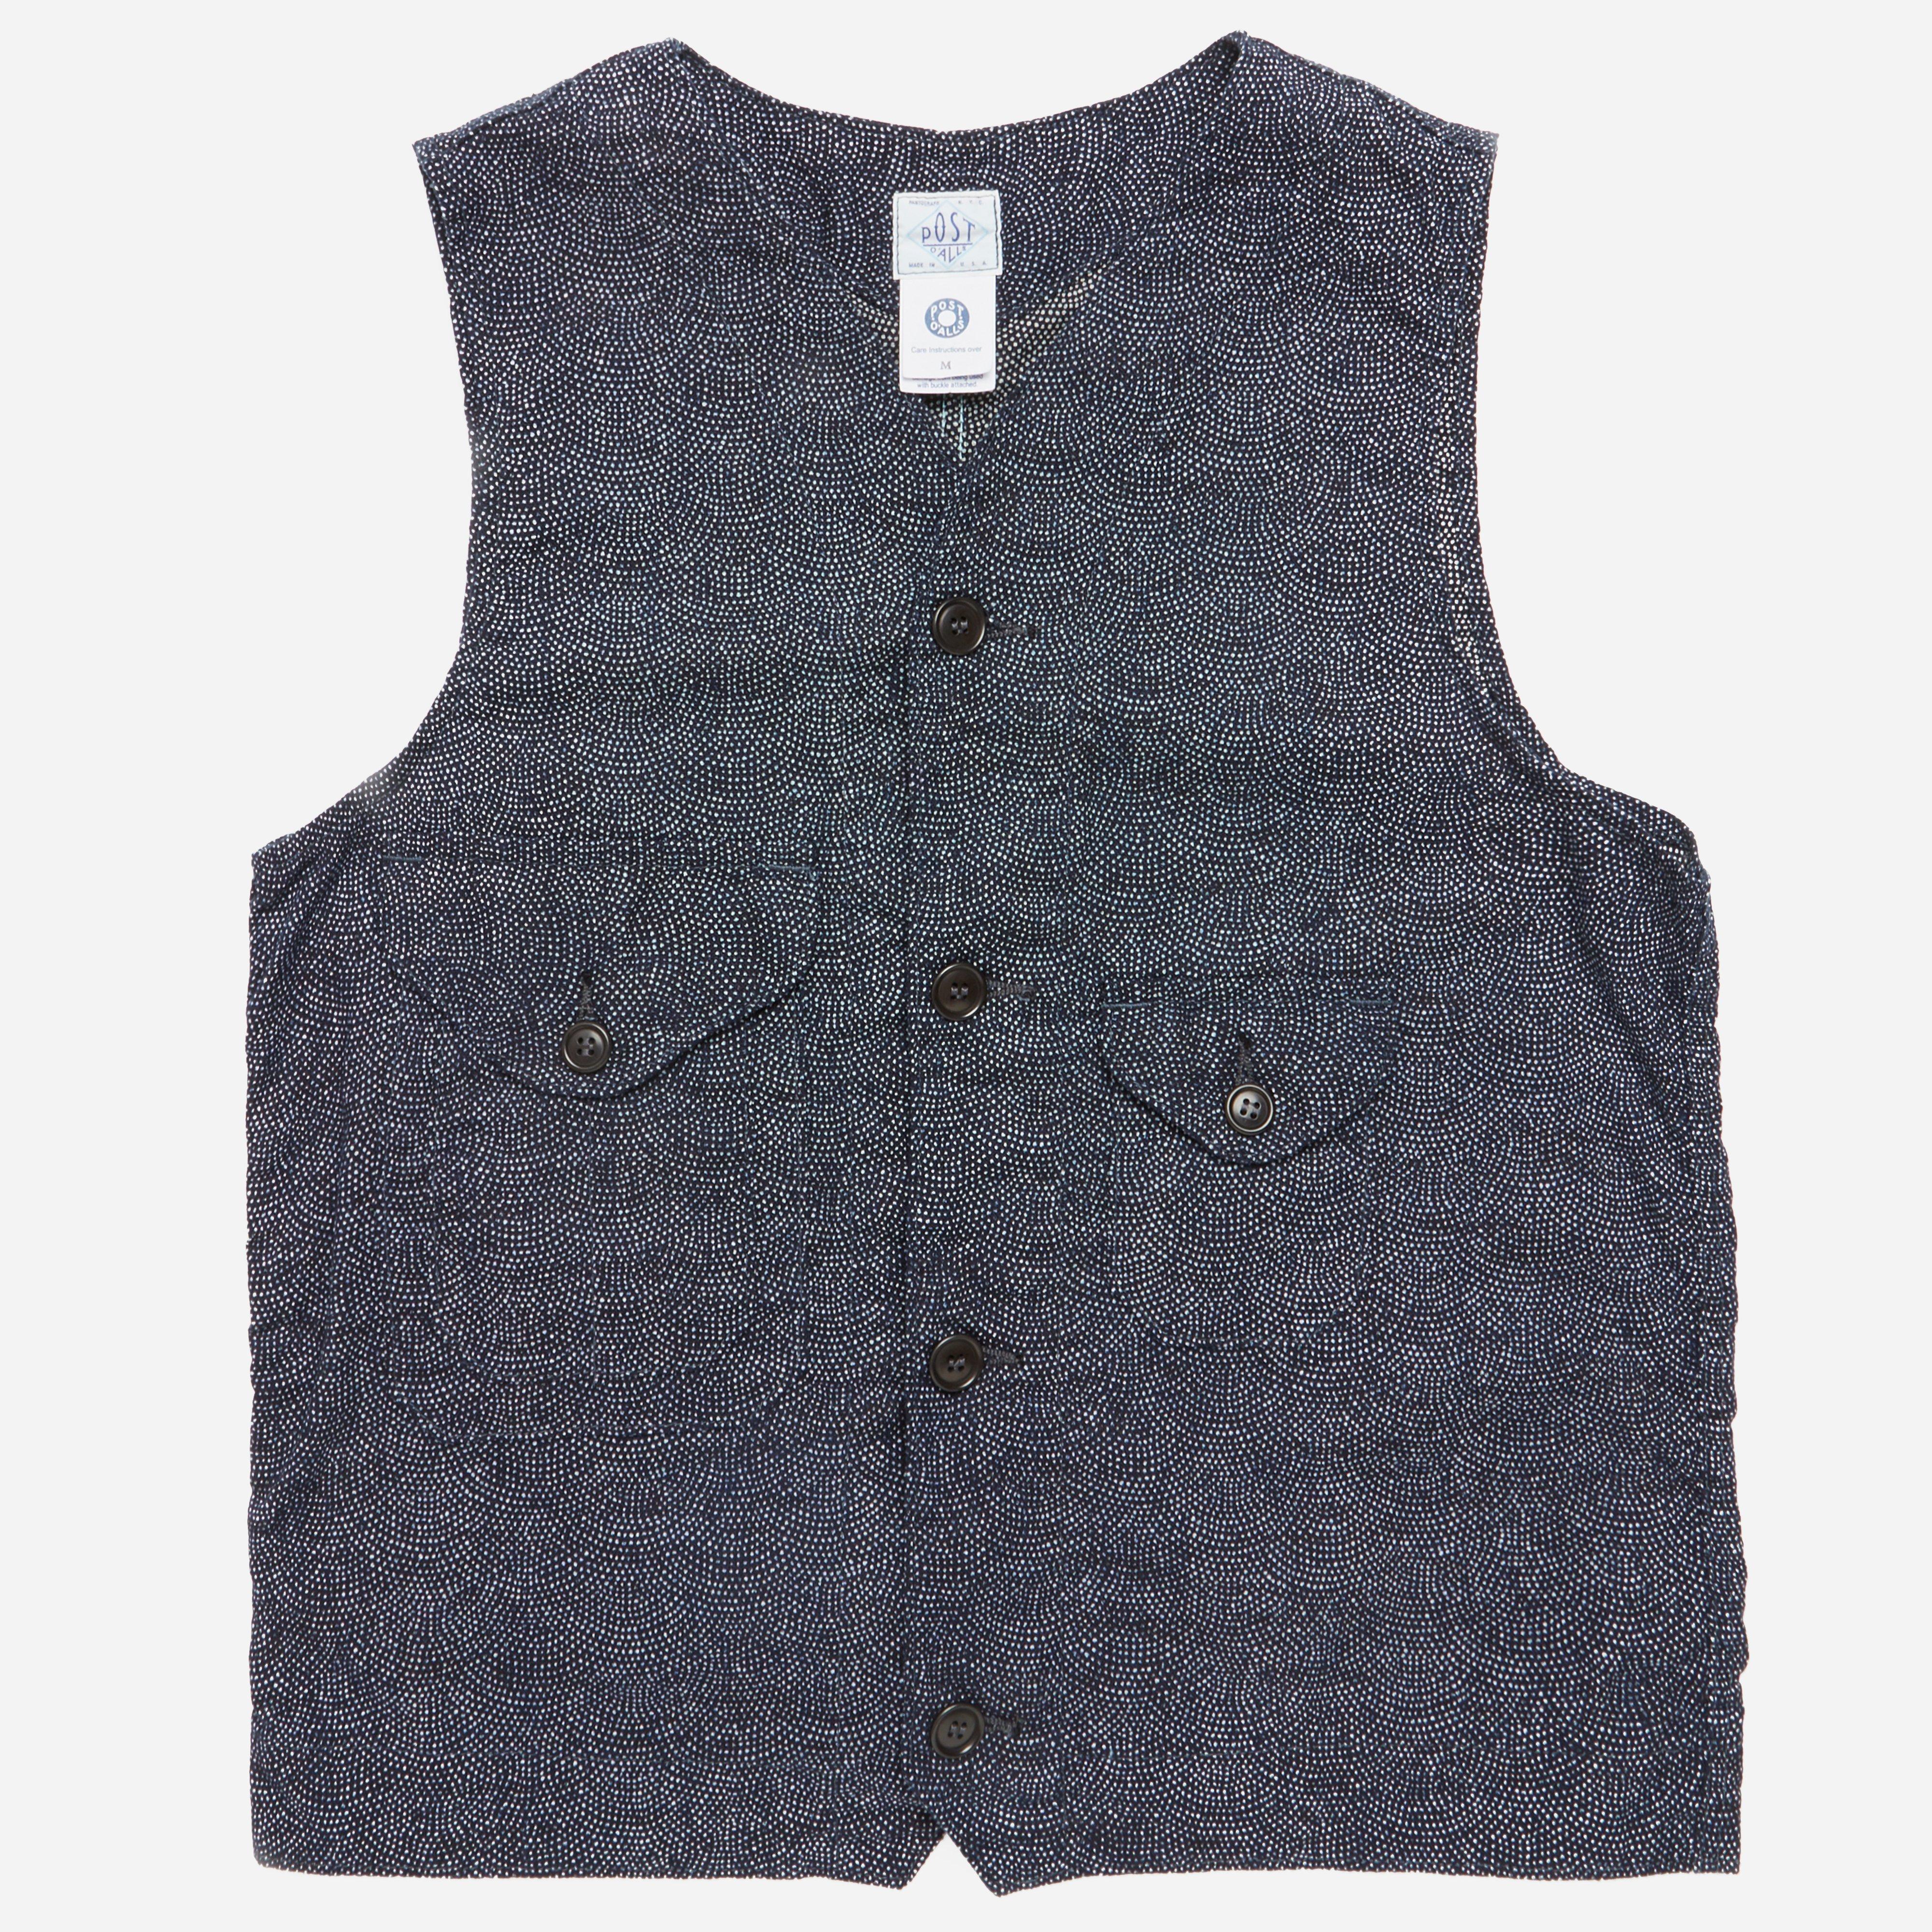 Post Overalls Cruzer Vest 2